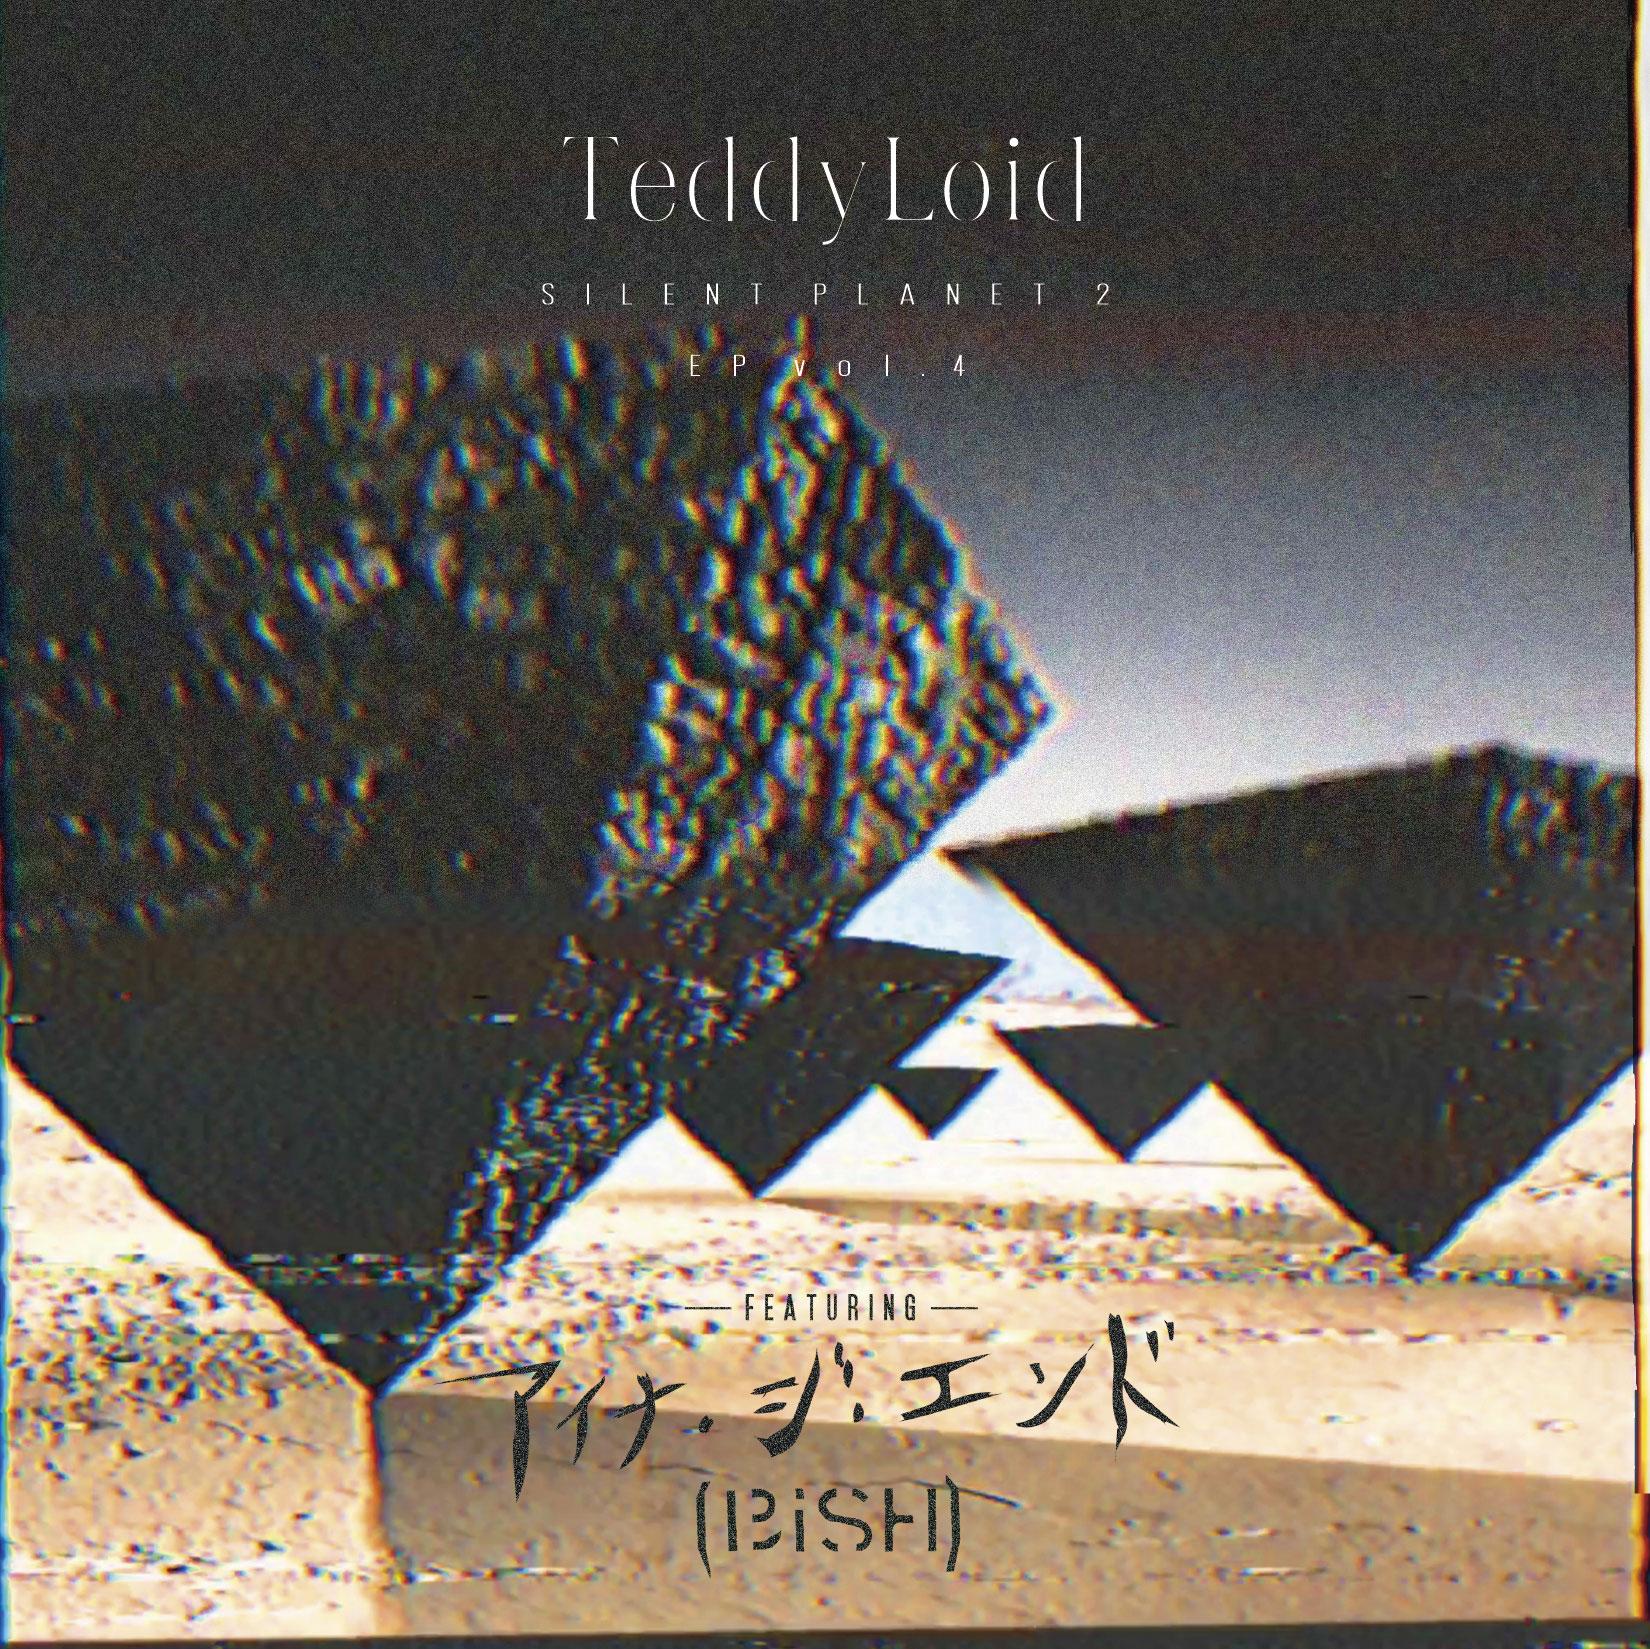 TEDDYLOID – SILENT PLANET 2 EP vol.4